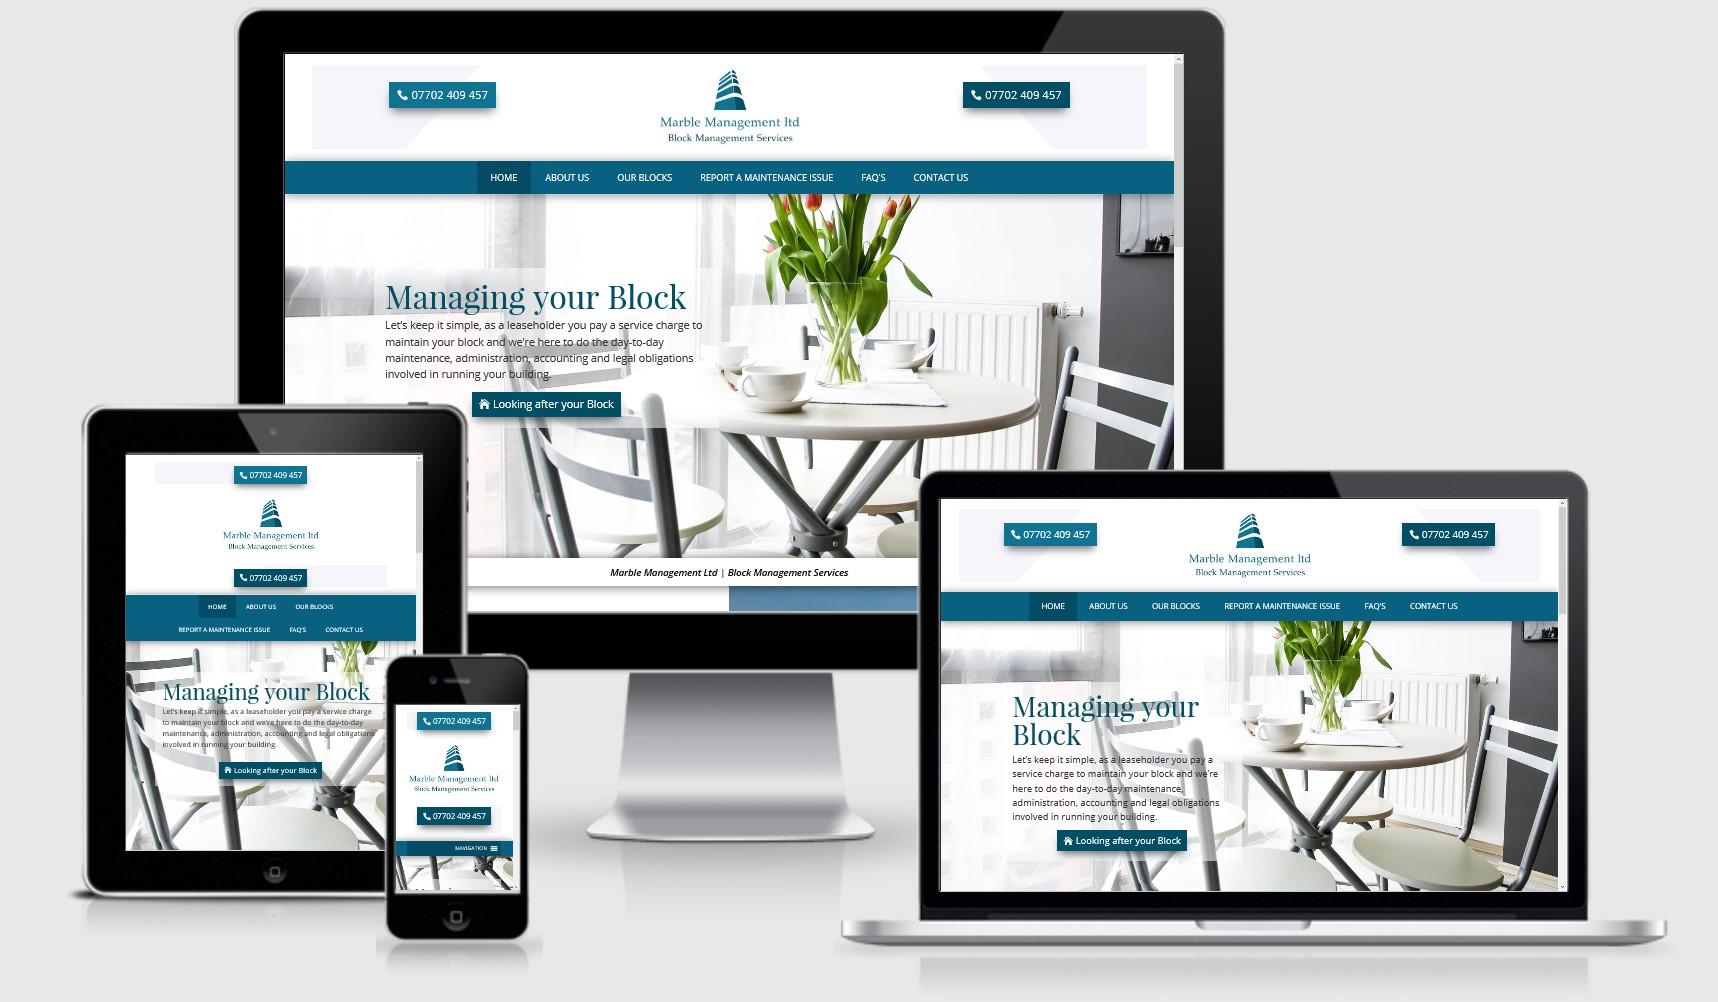 Marble Management London Website